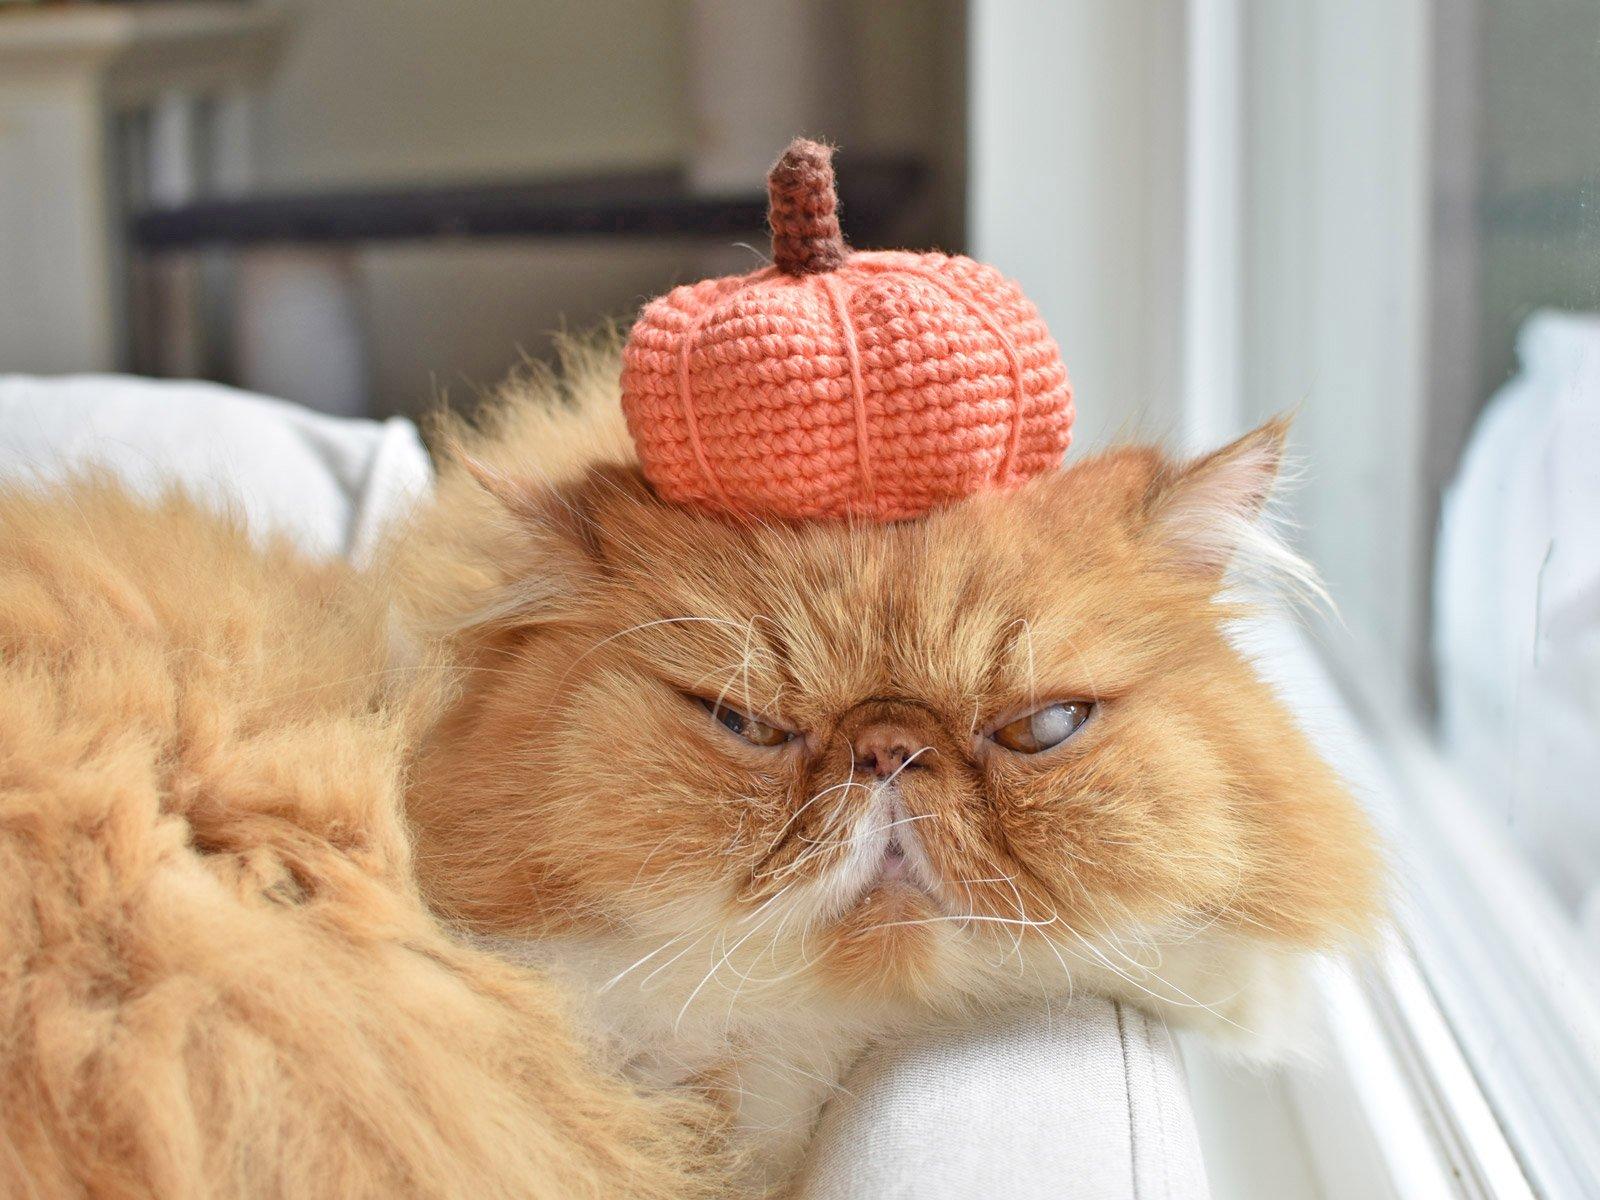 Cat wearing a crochet pumpkin hat.